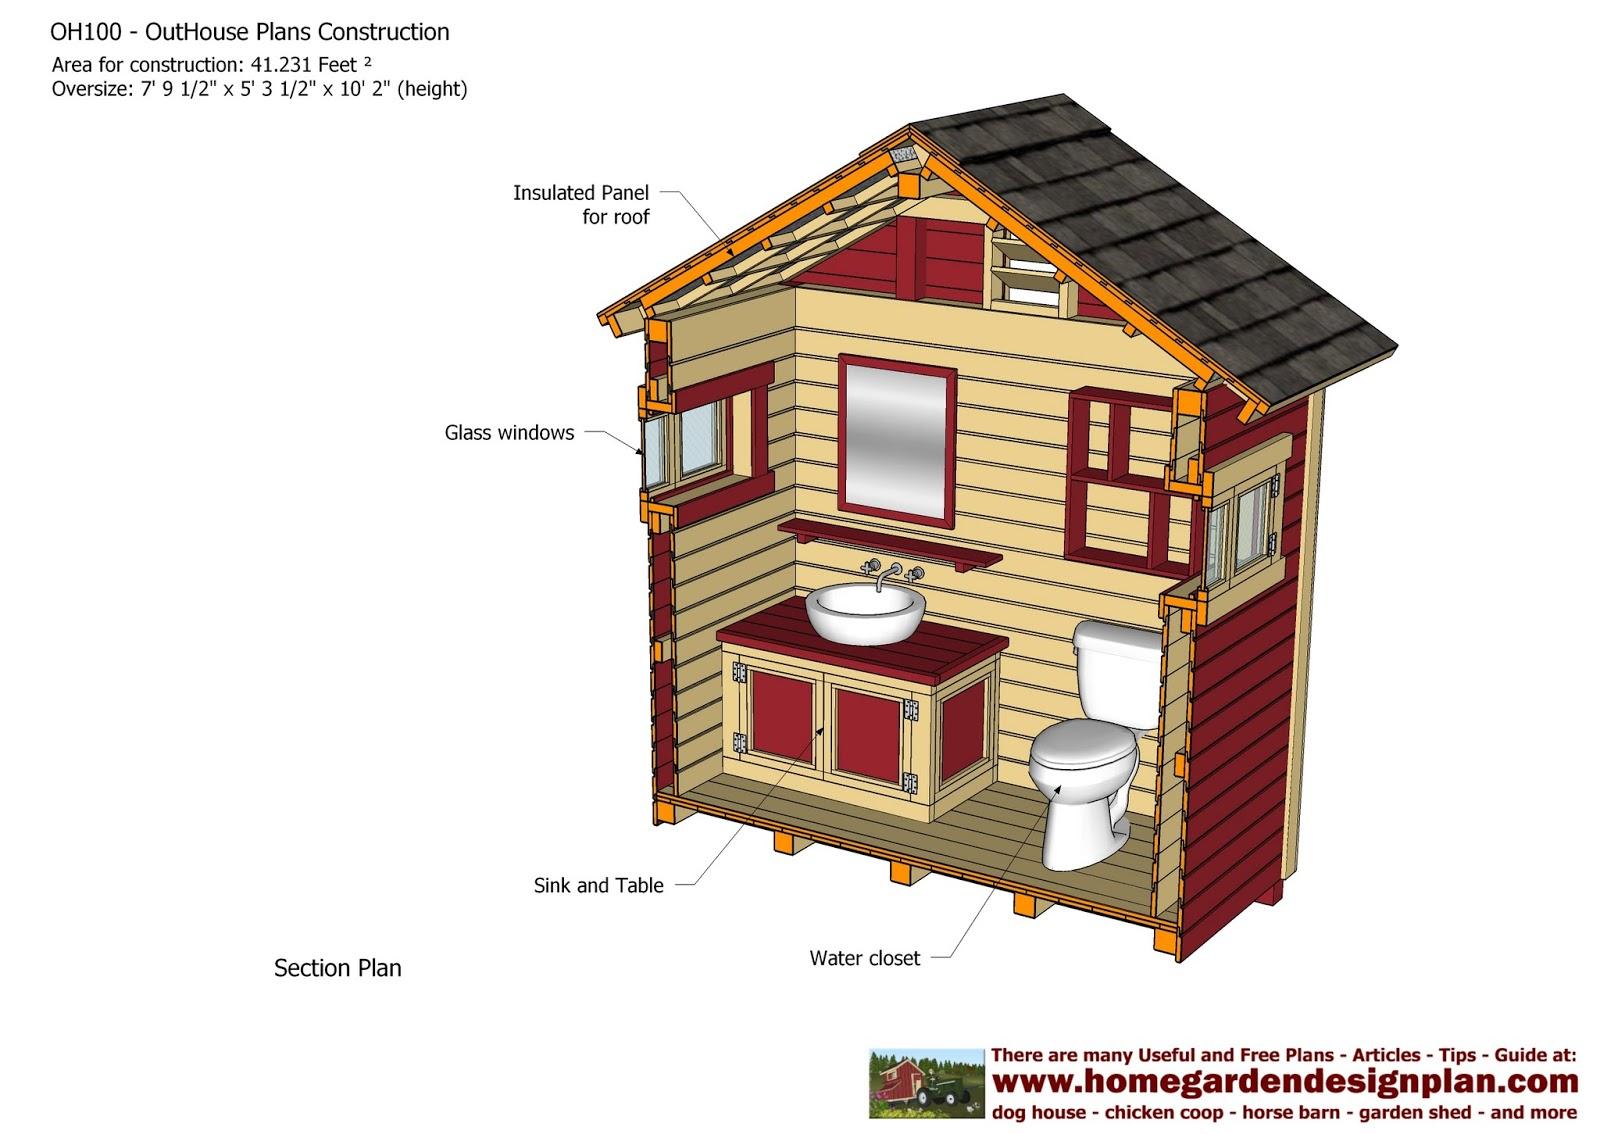 Superb Home Garden Plans Oh100 Out House Plans Construction Out Largest Home Design Picture Inspirations Pitcheantrous